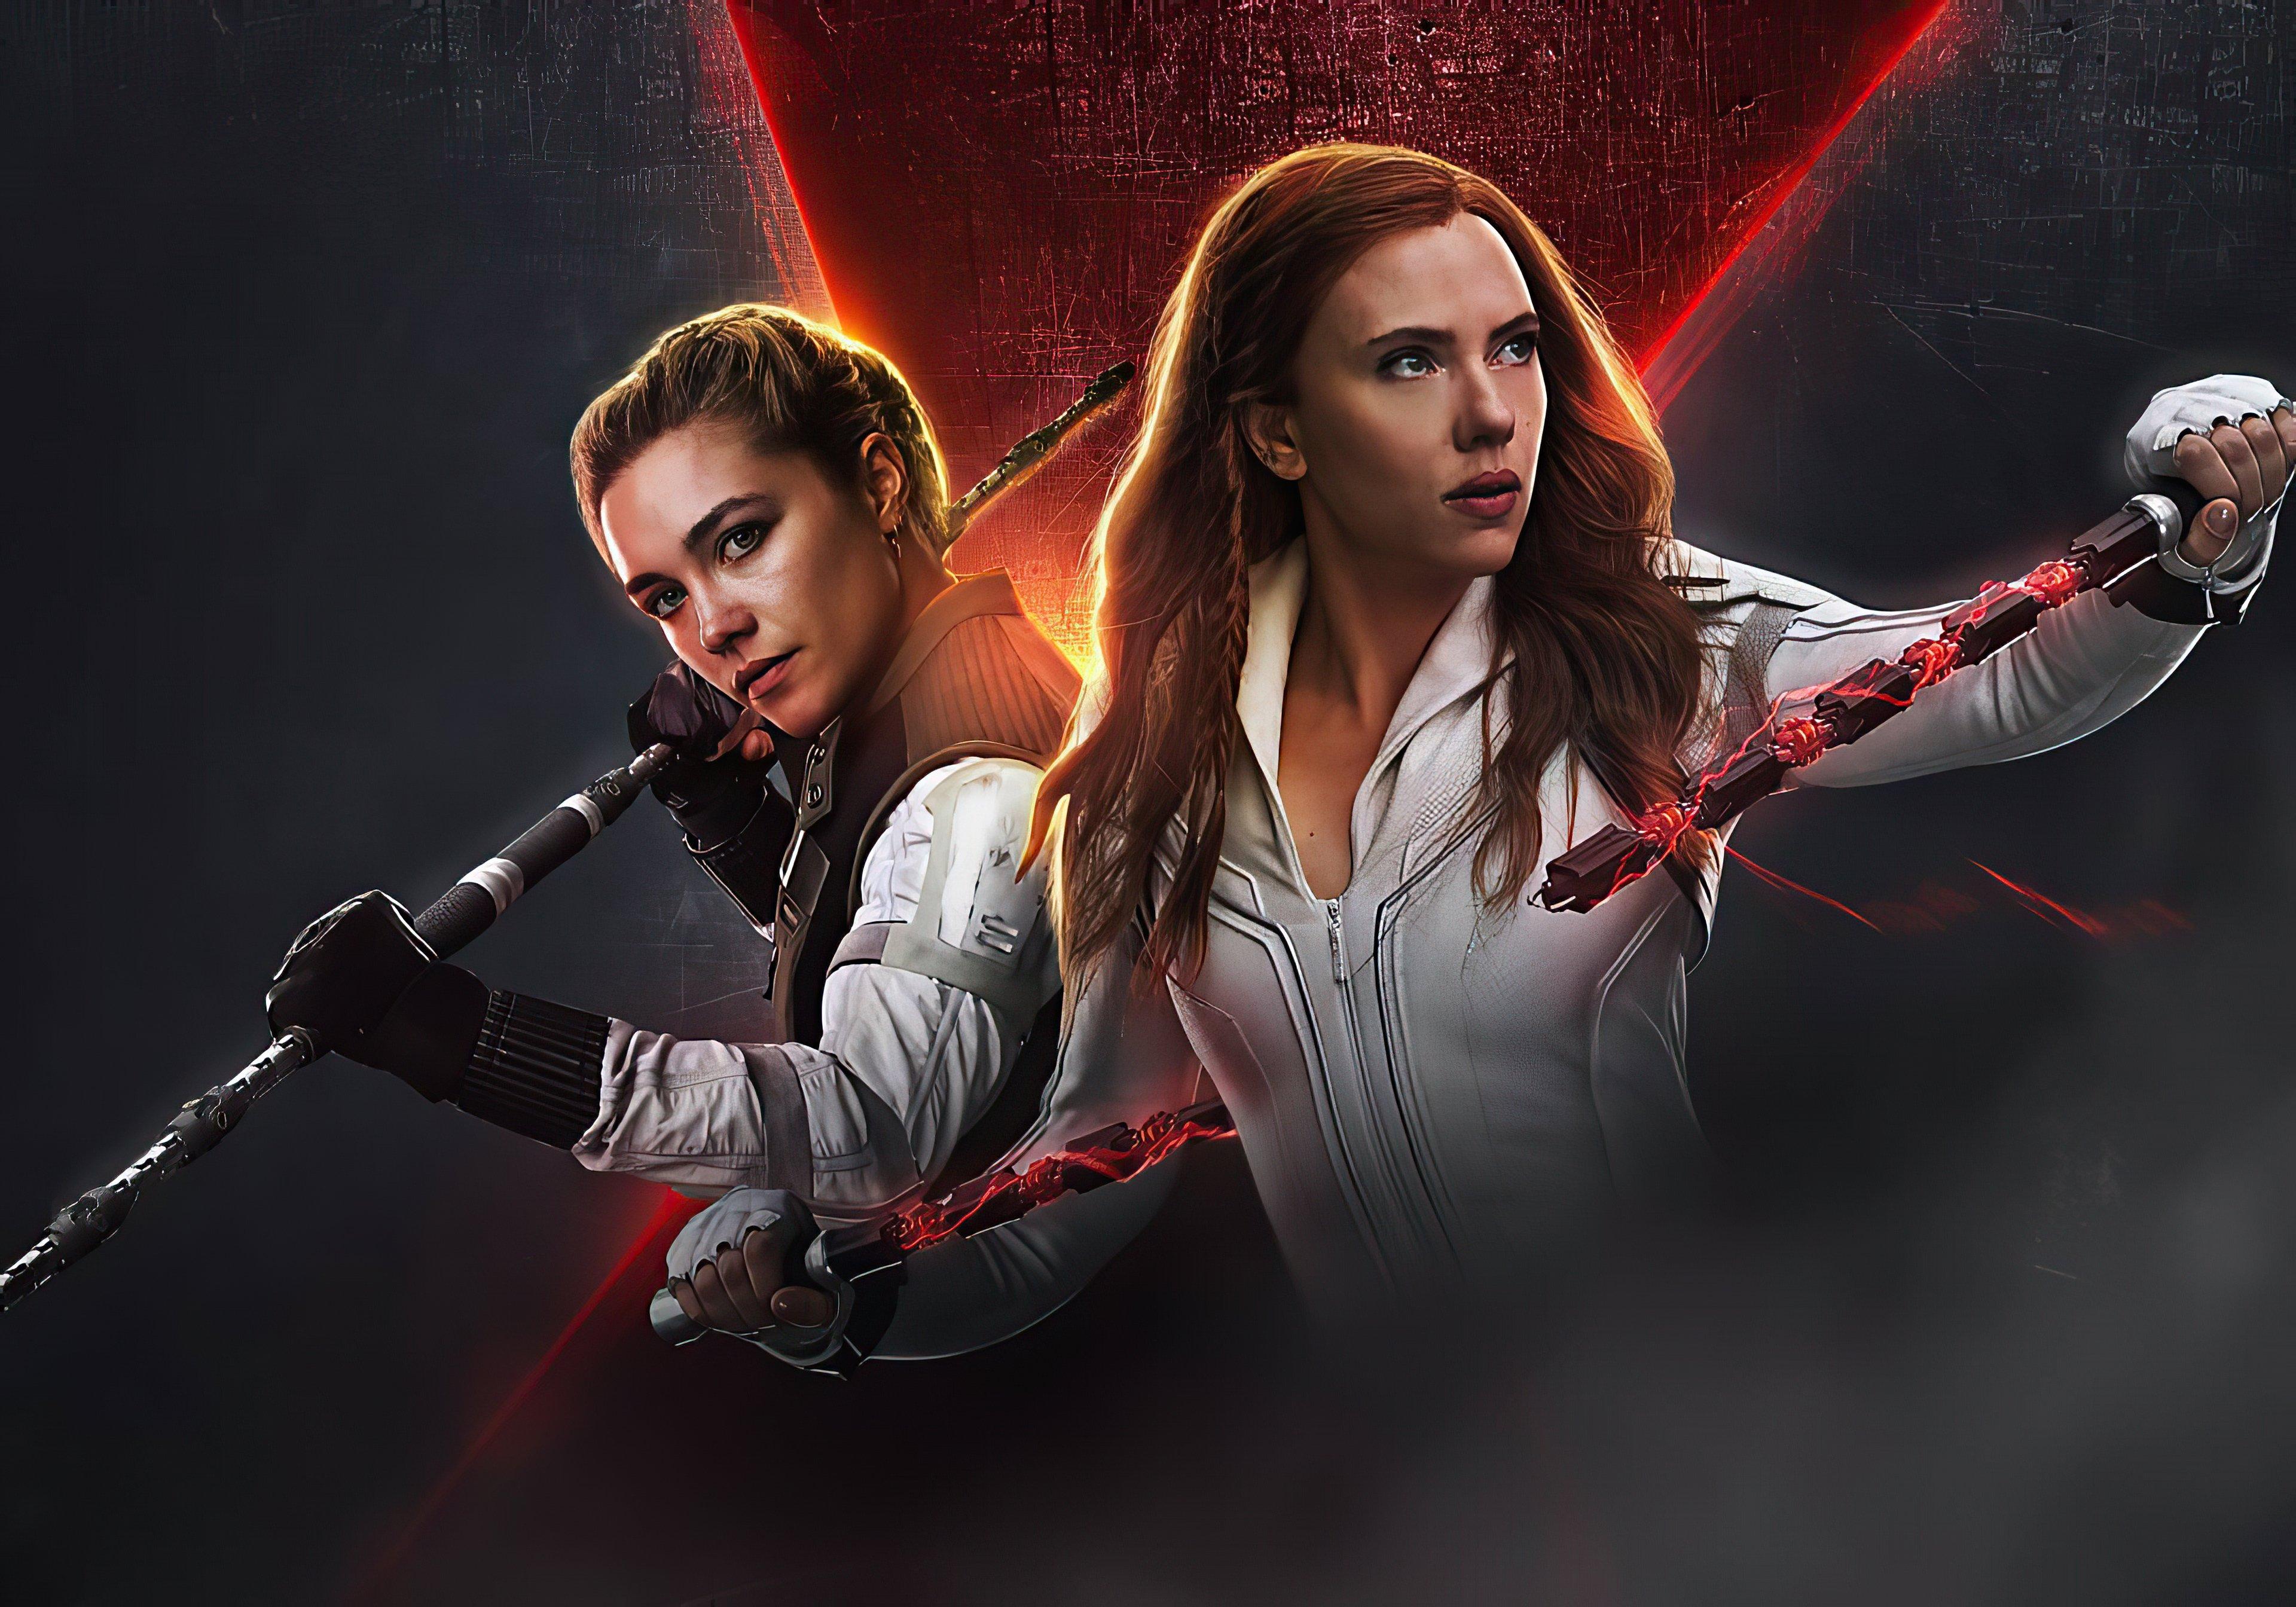 Wallpaper Black Widow Poster 2020